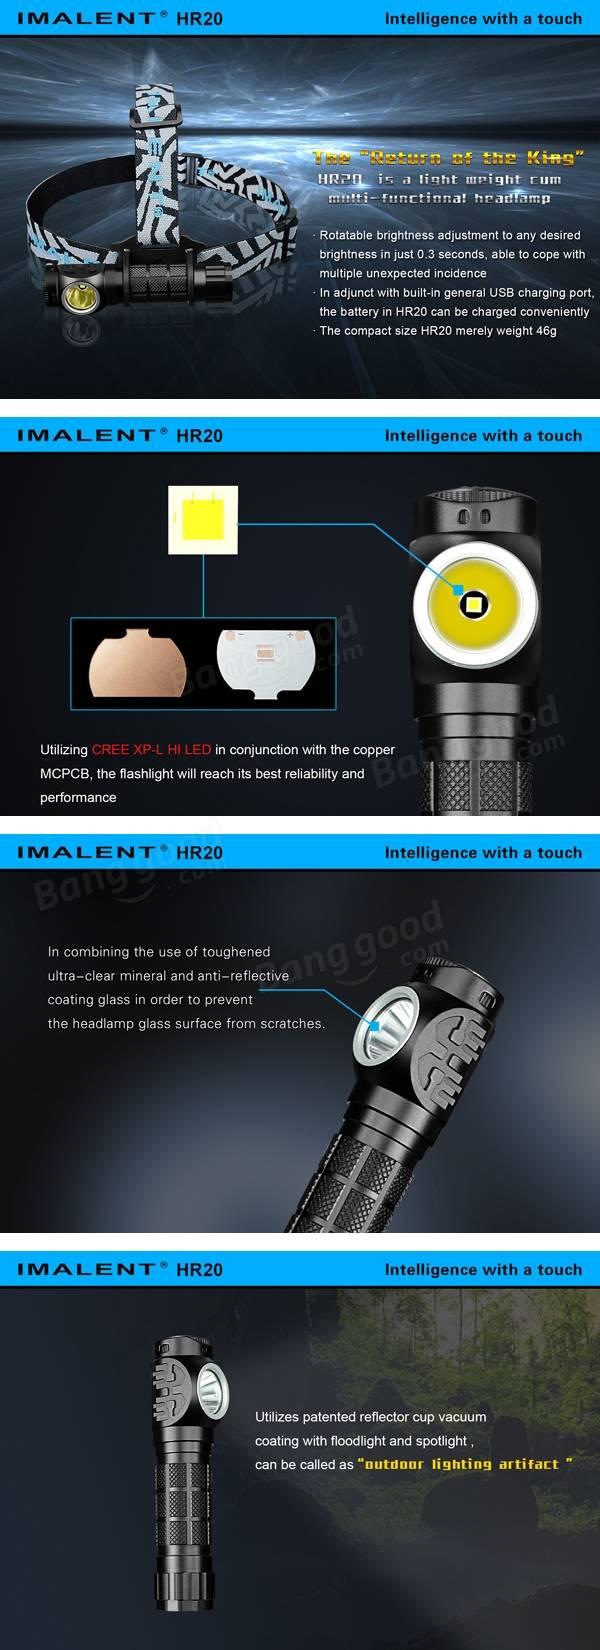 IMALENT HR20 XP-L HI 1000LM 18650 Outdoor LED Headlamp Flashlight